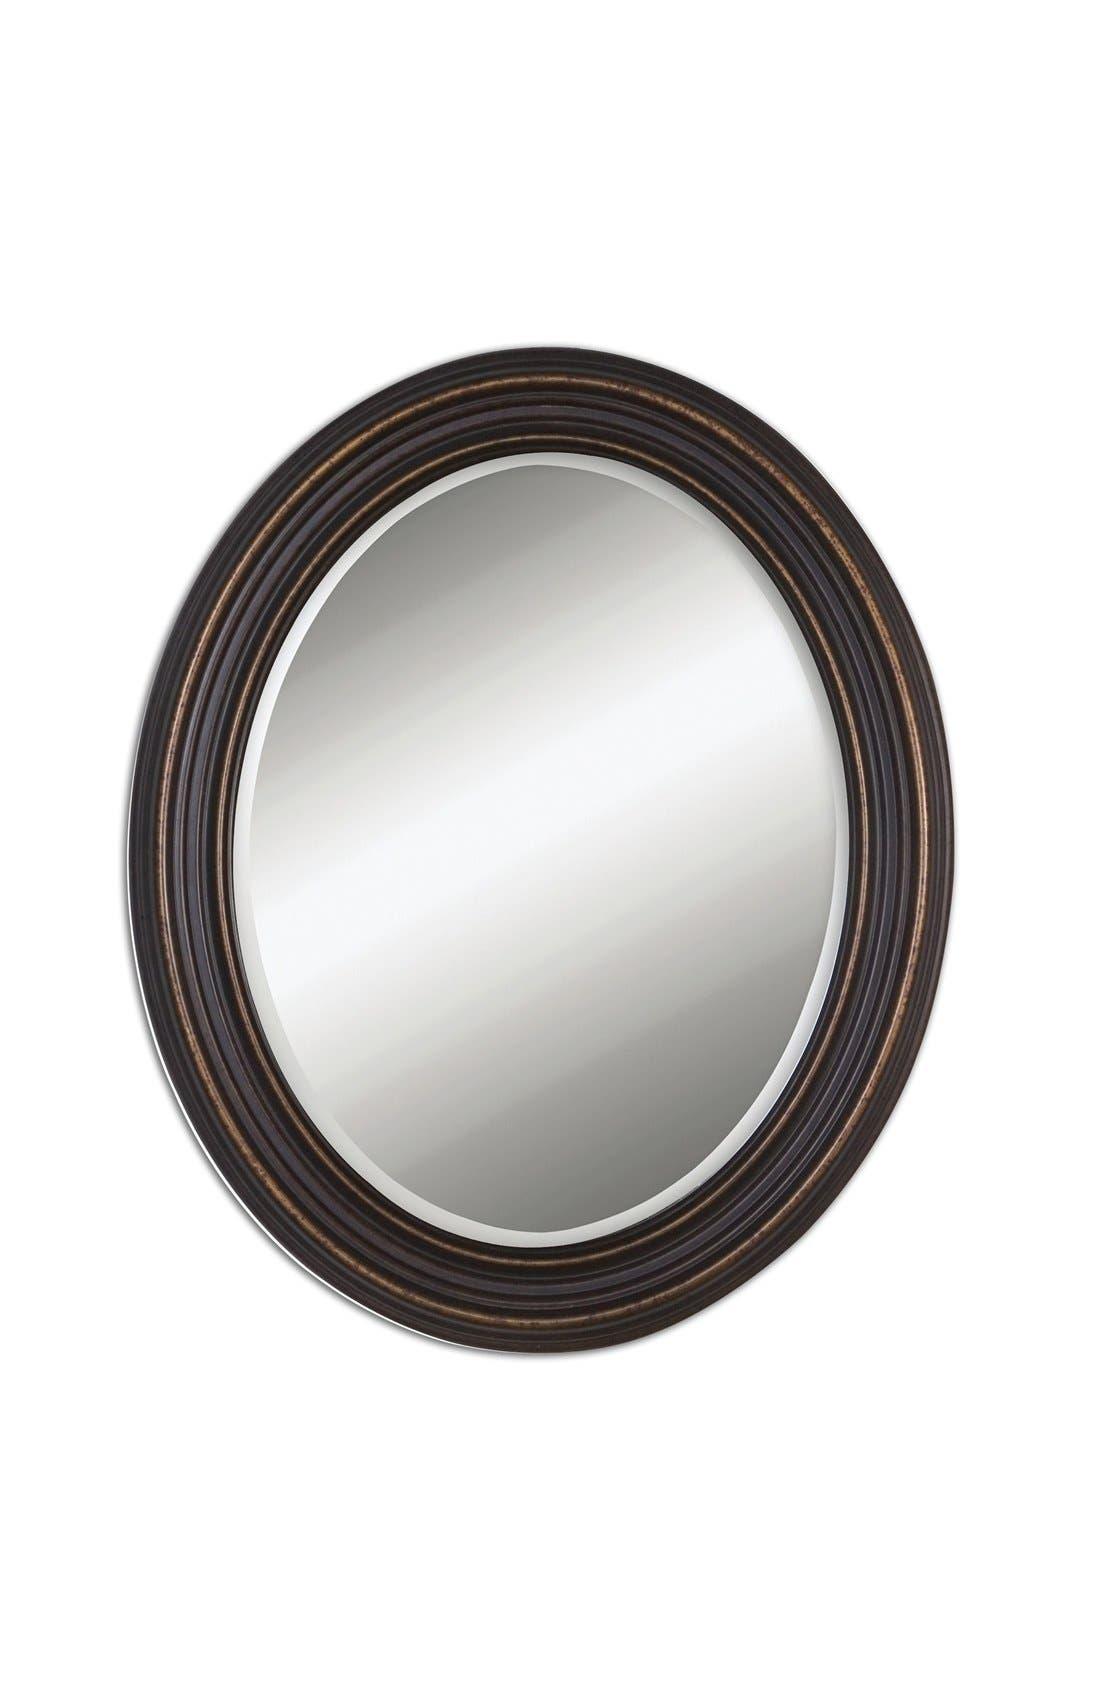 Uttermost 'Ovesca' Oval Mirror